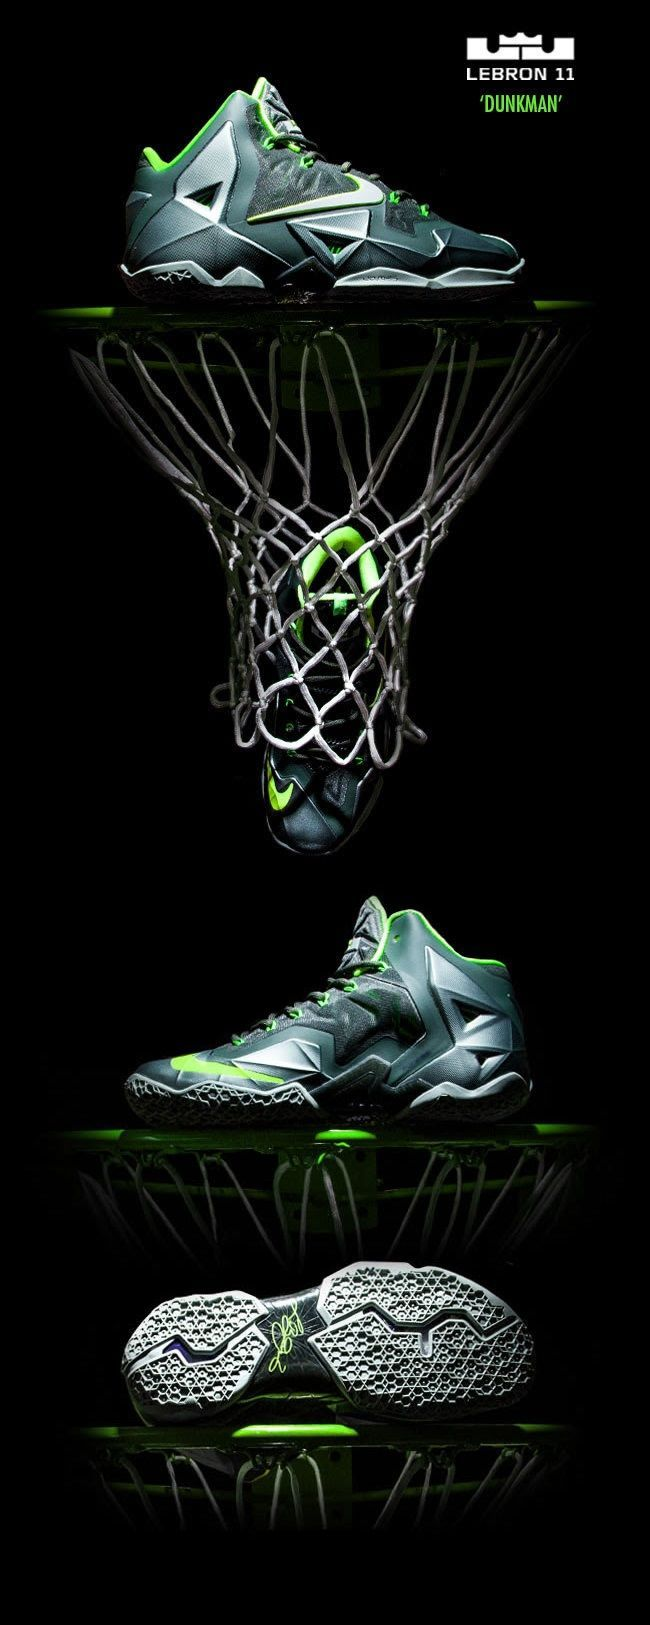 Nike Lebron 11 'Dunkman' New Hip Hop Beats Uploaded EVERY SINGLE DAY http://www.kidDyno.com